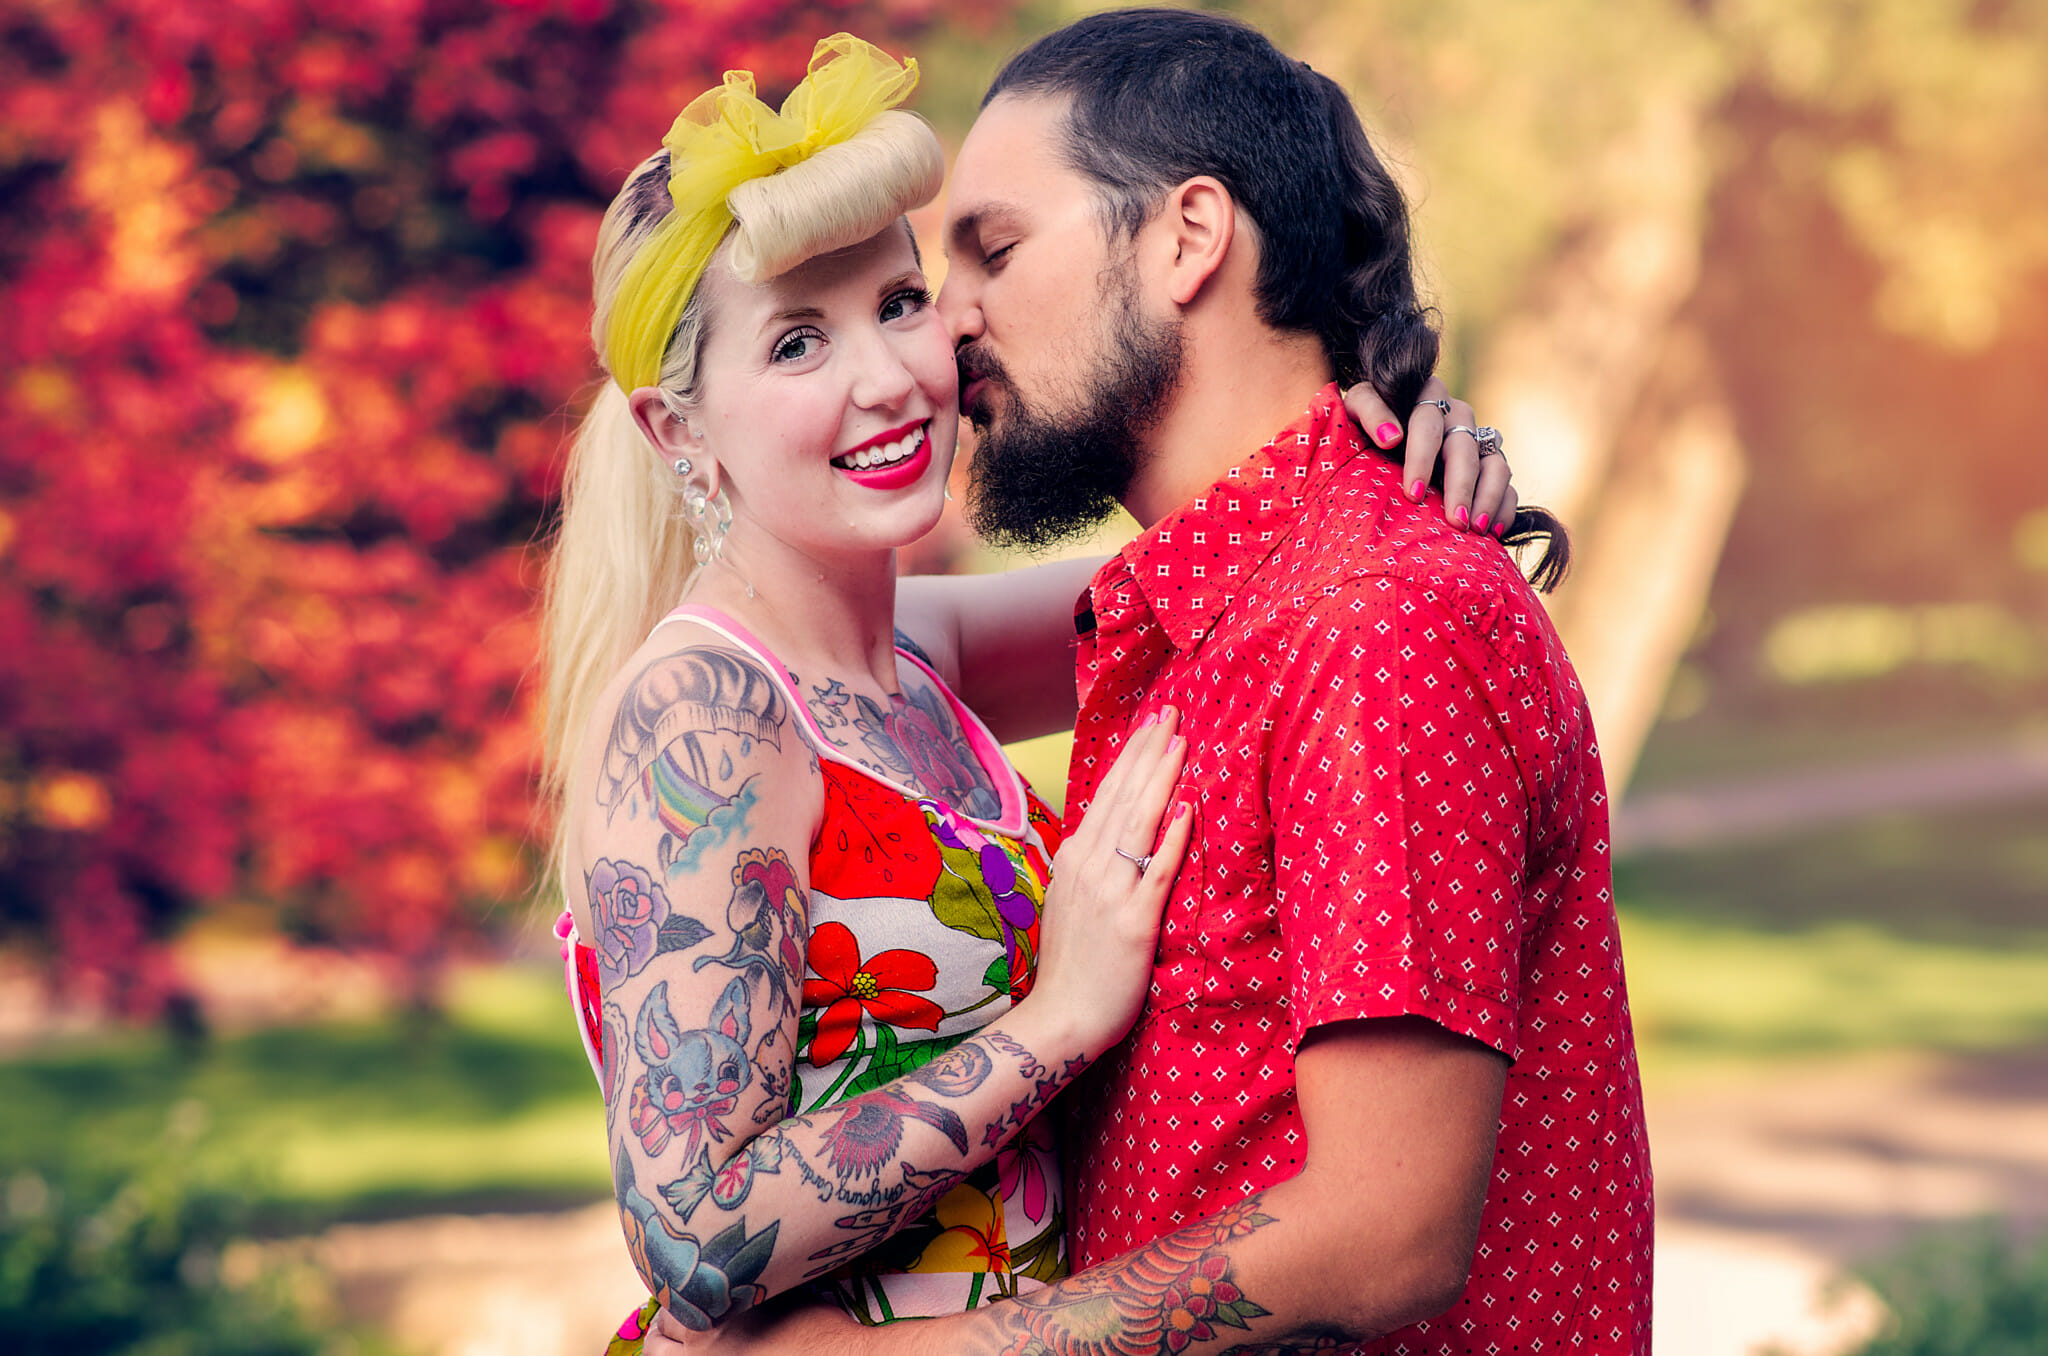 boyfriend kisses girlfriends cheek in park